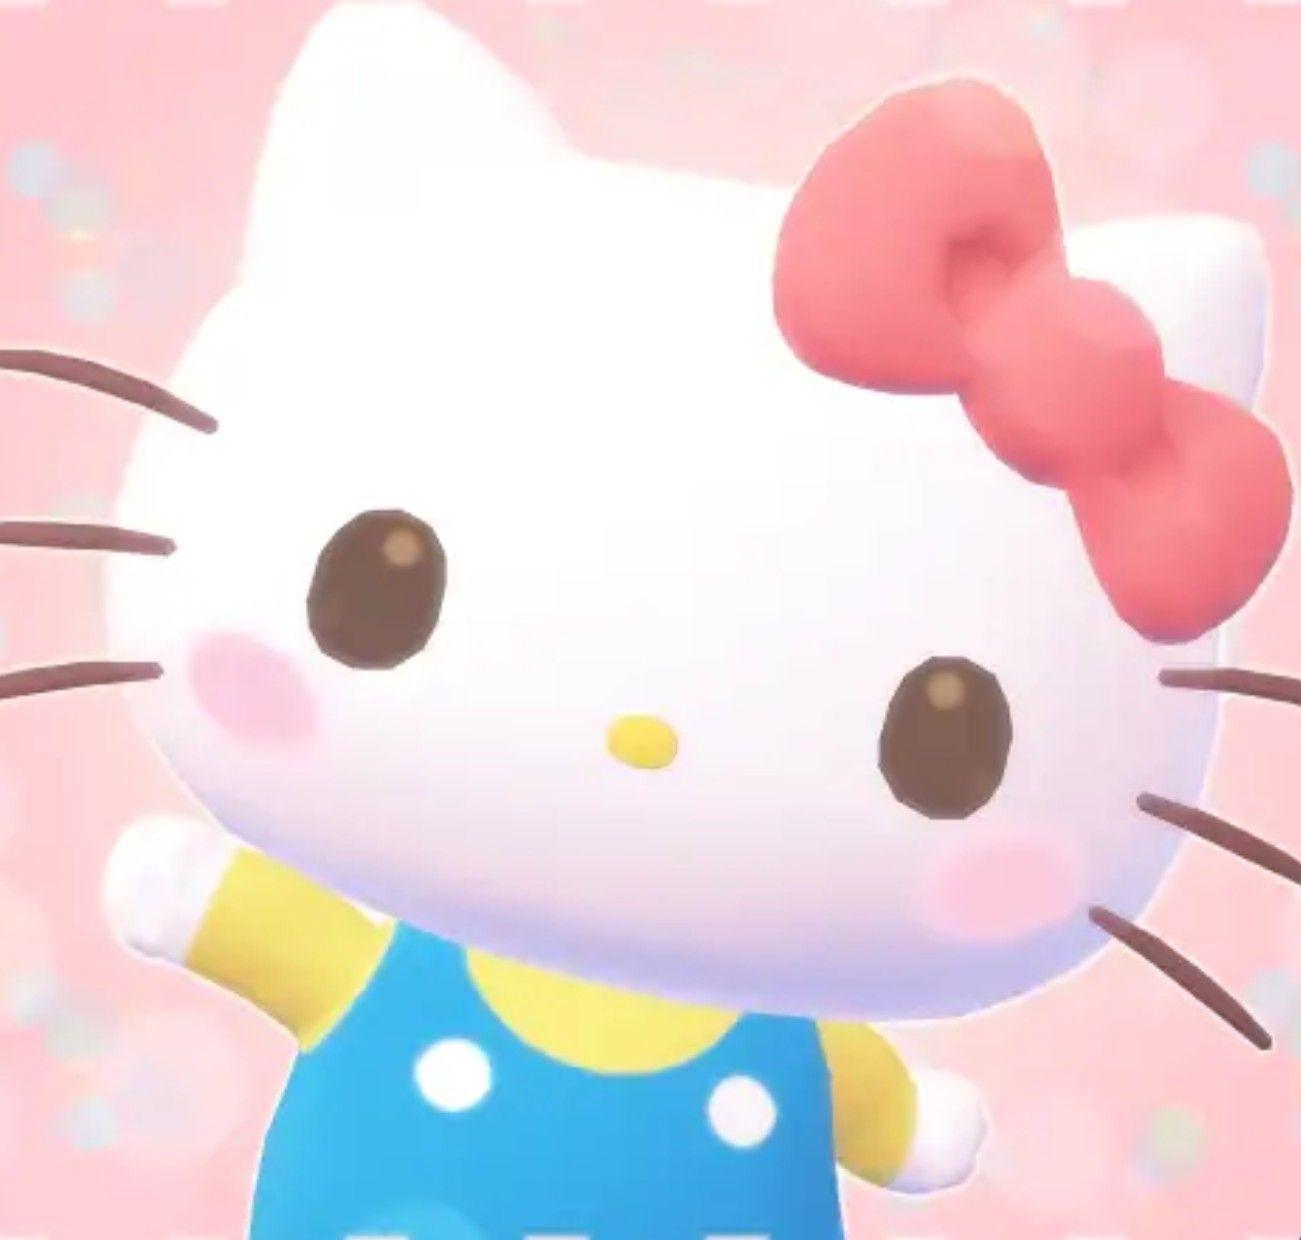 Kawaii, Cute, Adorable, Sweet, Aesthetic, Pink, Sanrio